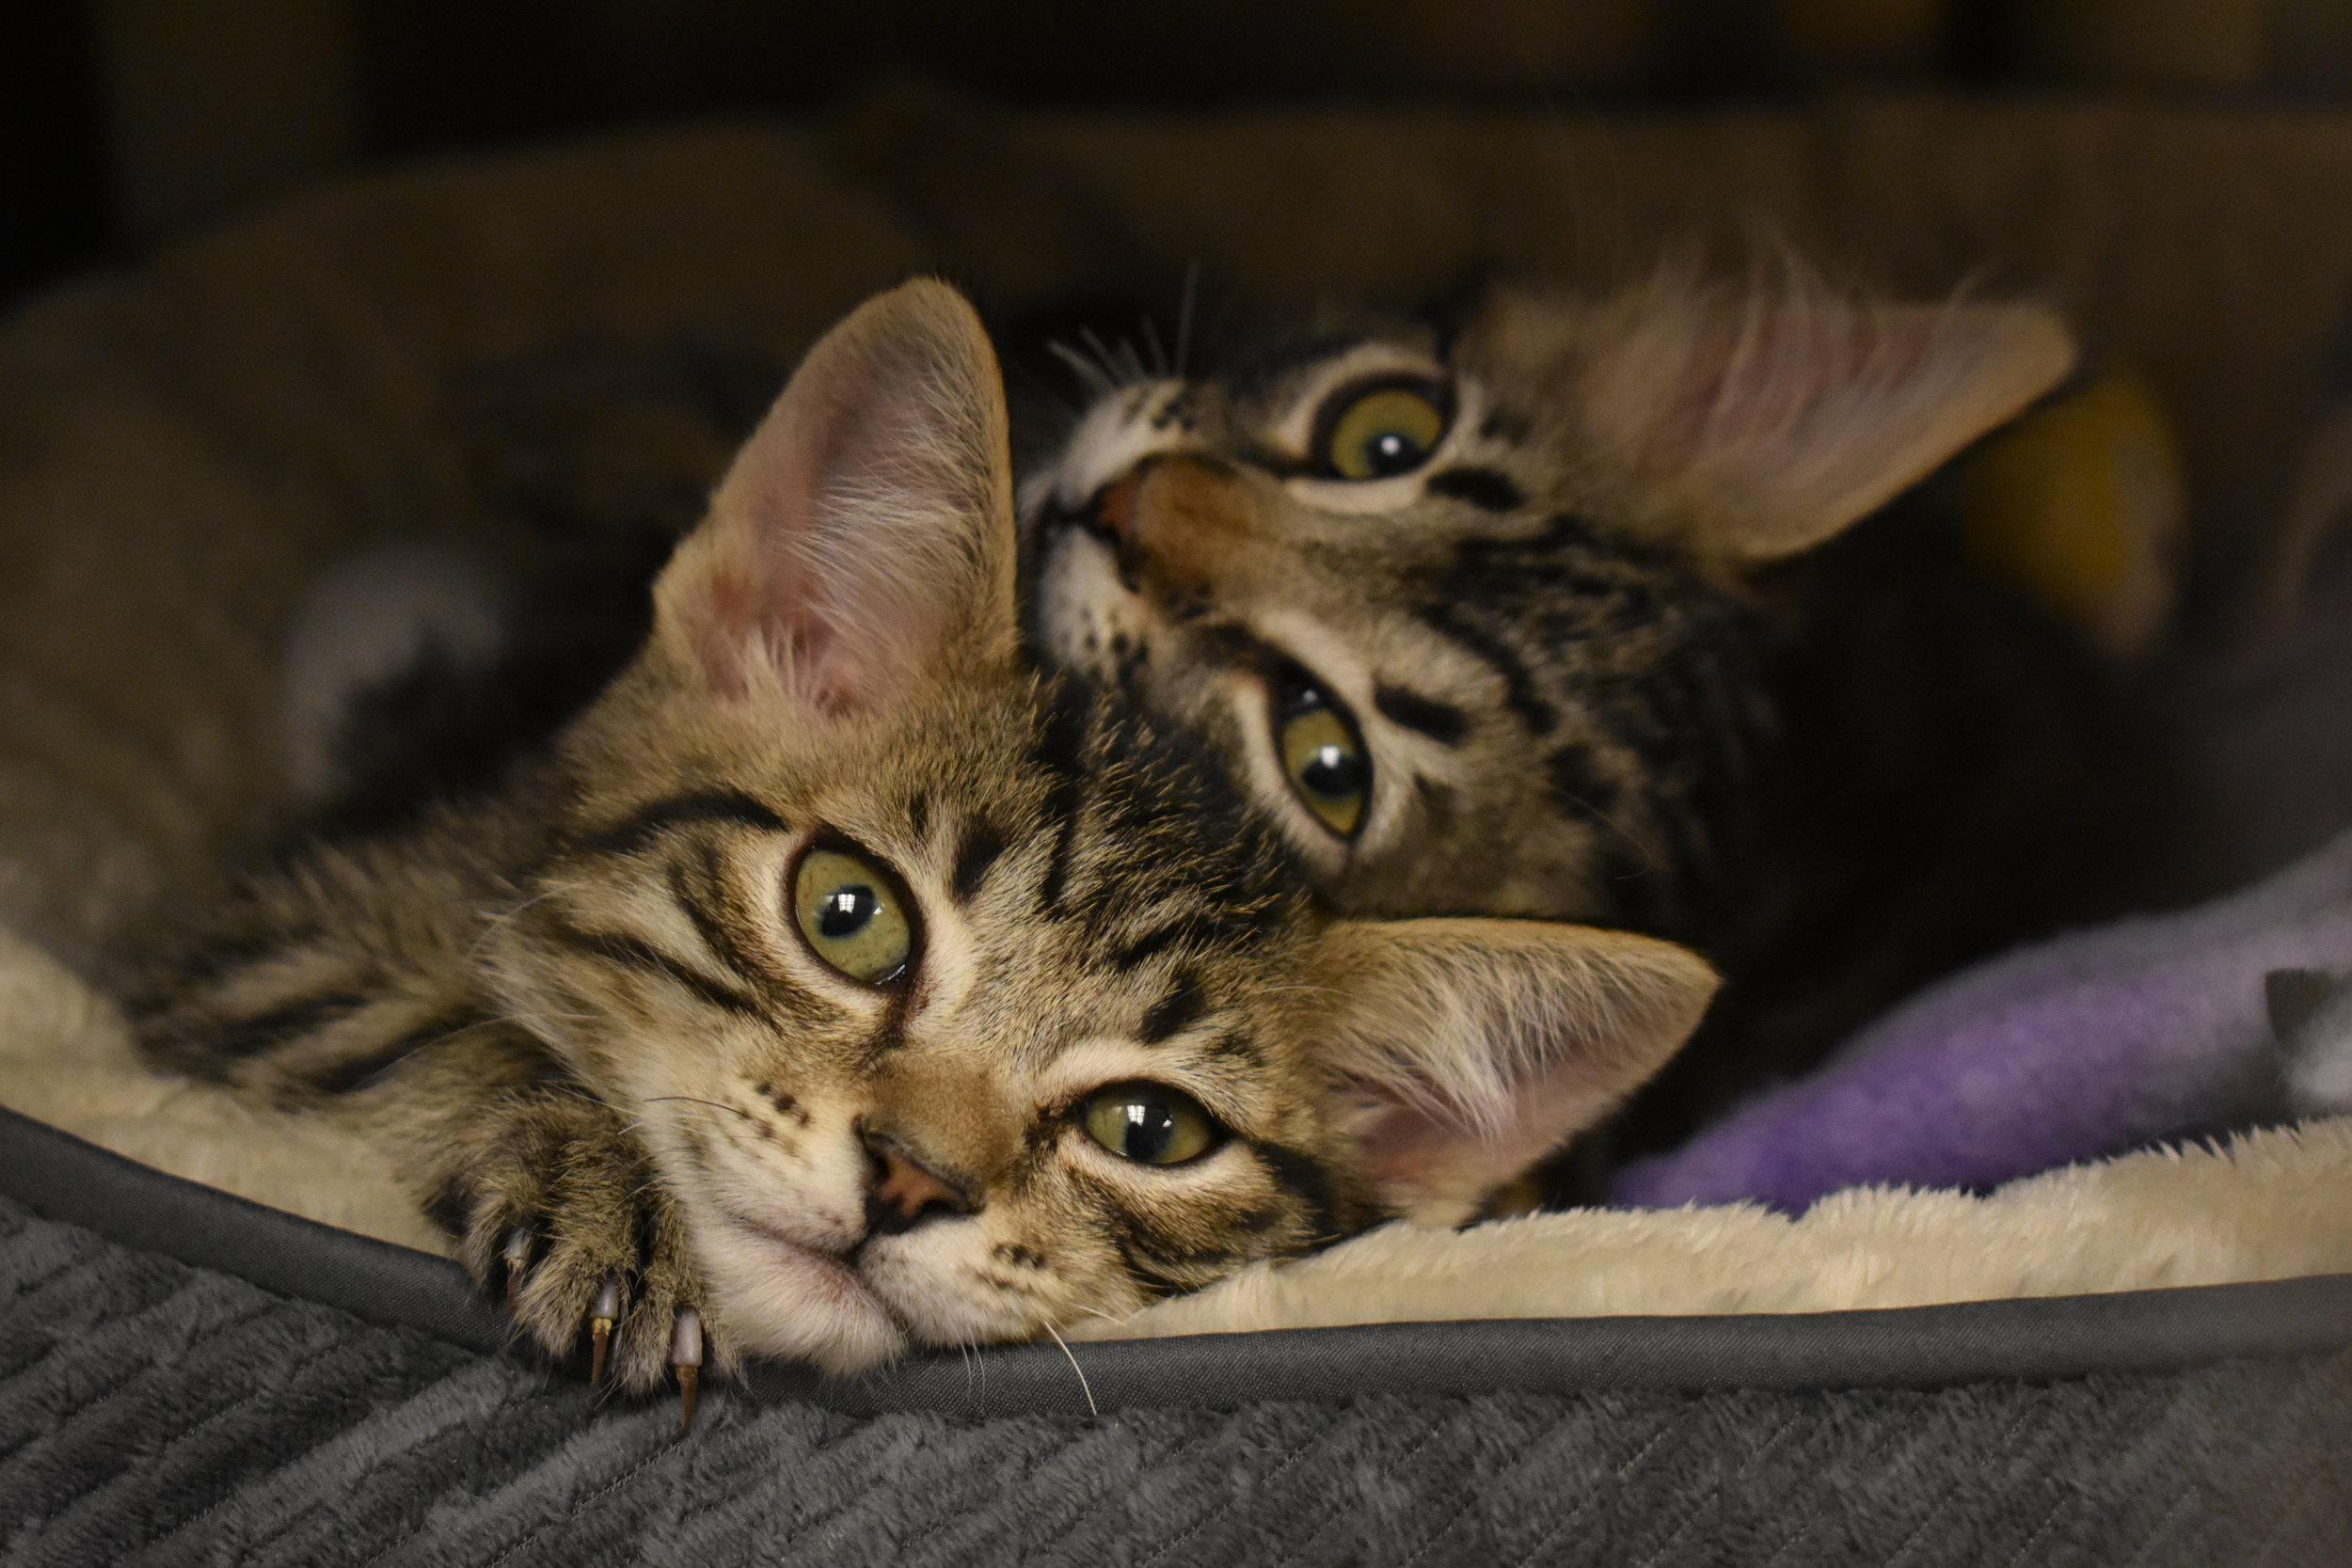 2 cute kittens 2.JPG